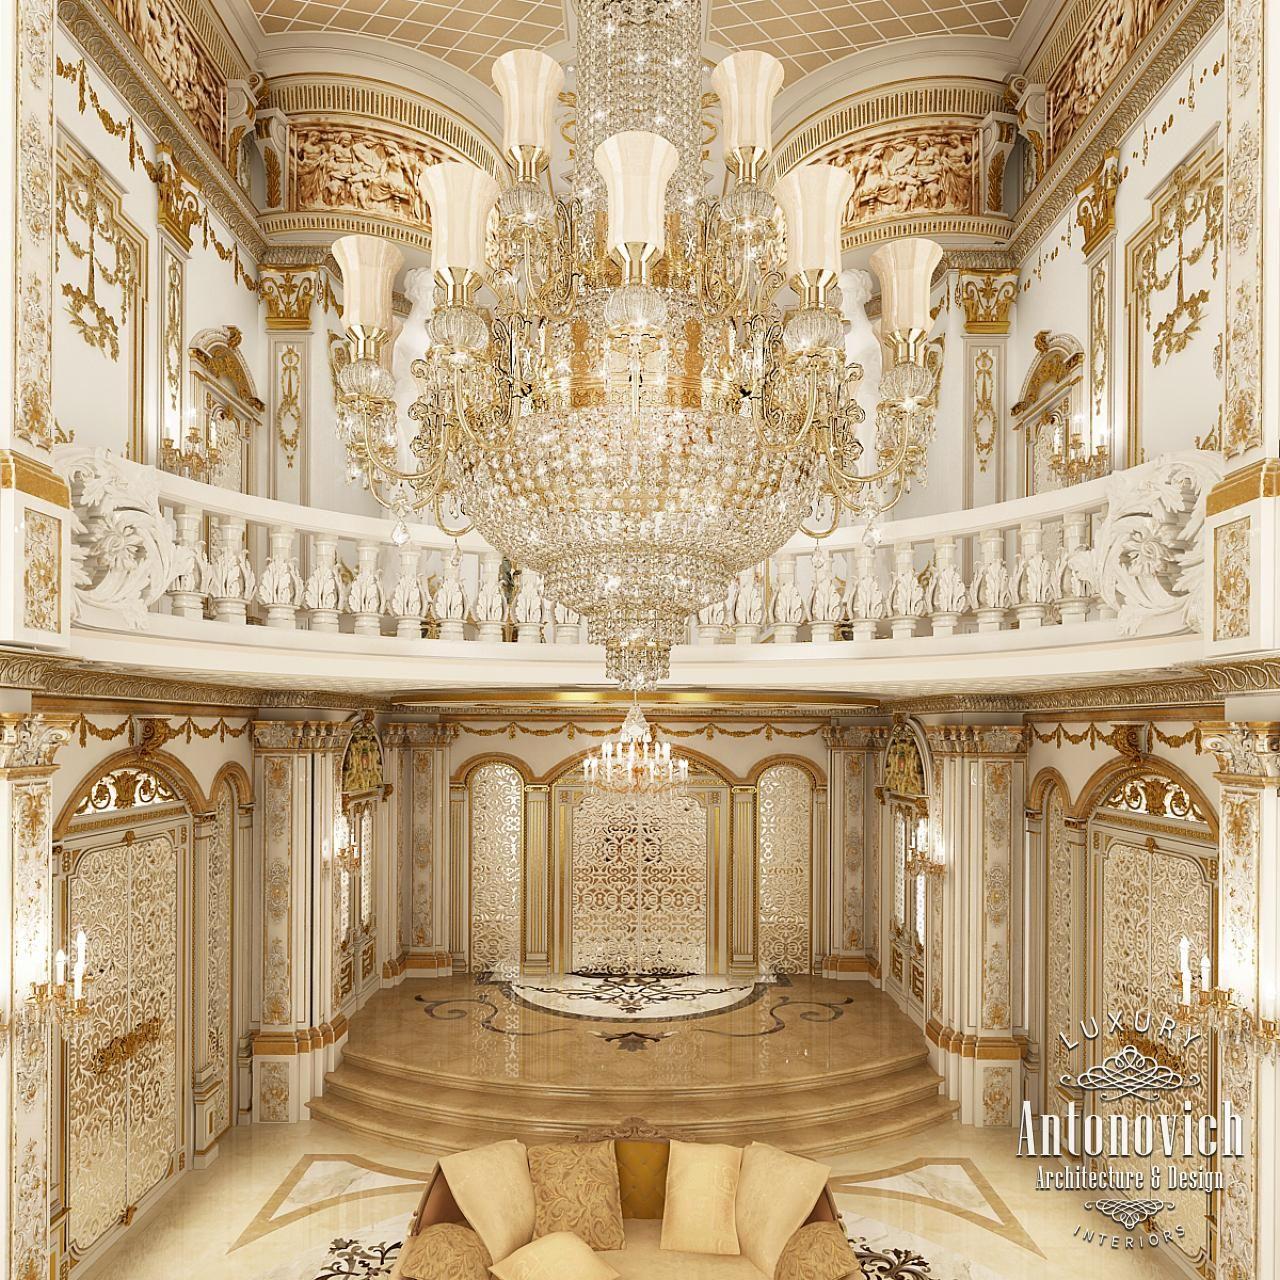 Luxury Residence By Dallas Design: Villa Interior Design In Dubai, Luxury Residential Villas